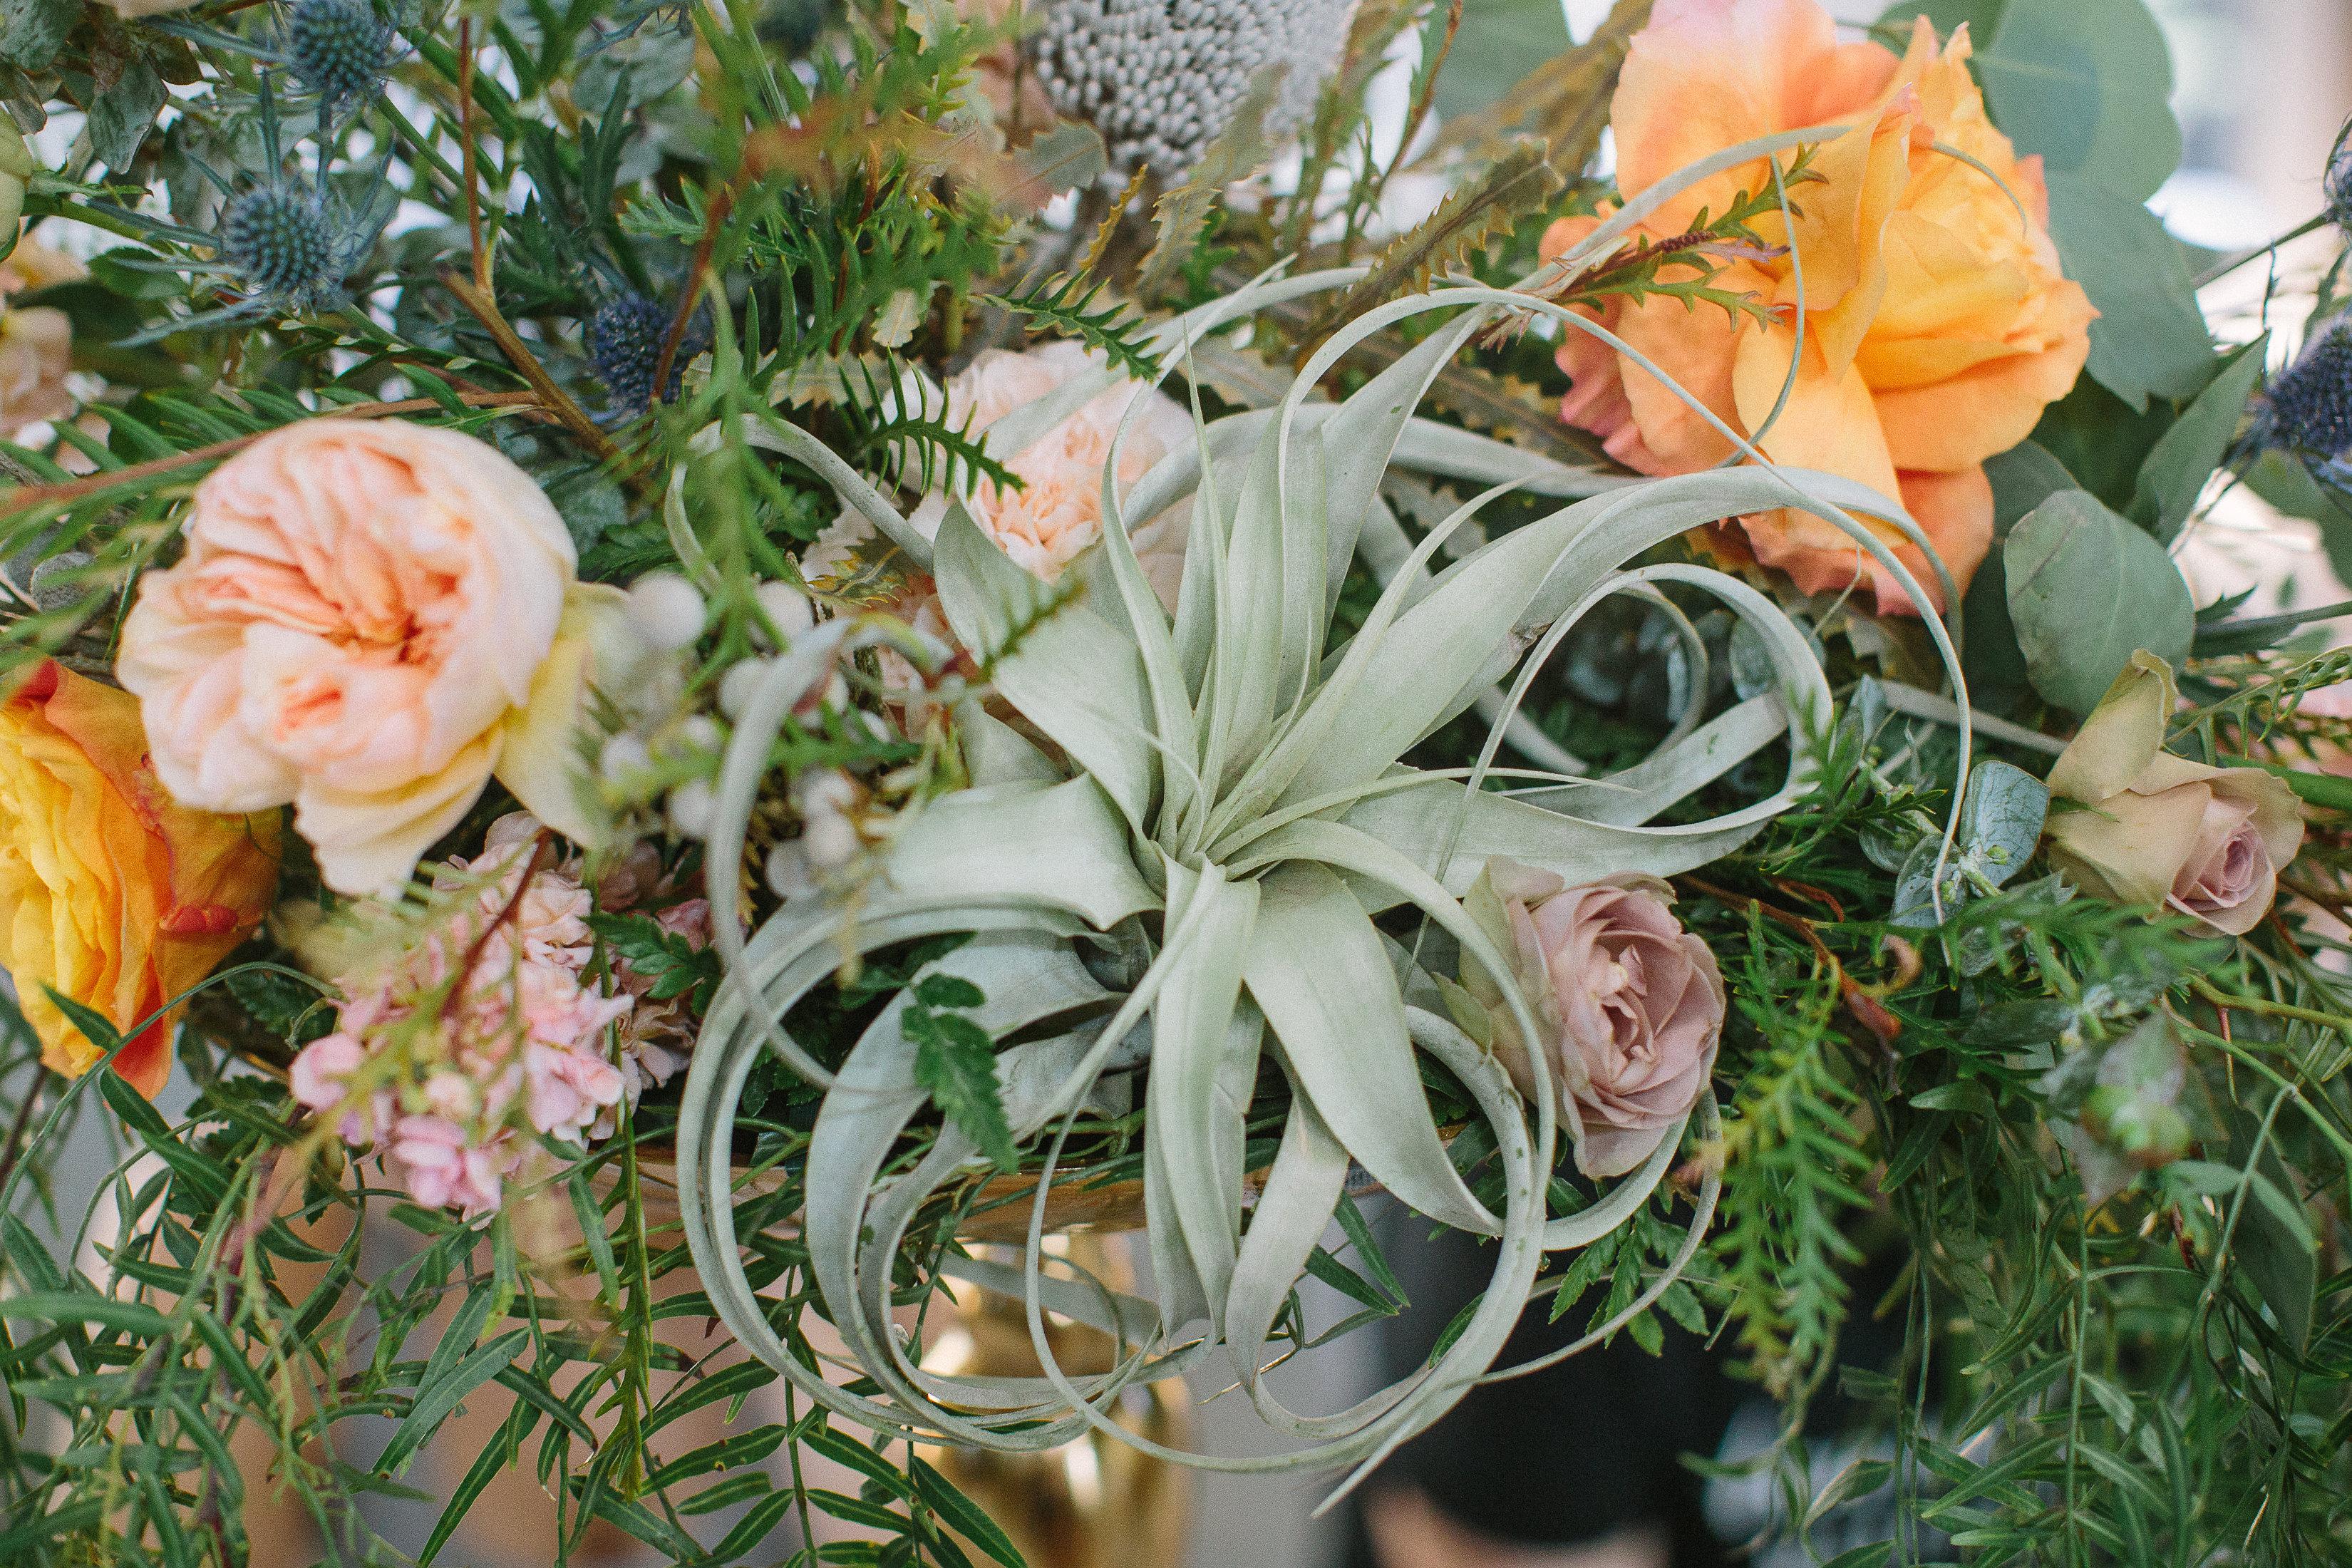 Ellen-Ashton-Photography-Peach-Creek-Ranch-Weddings-Wed-and-Prosper161